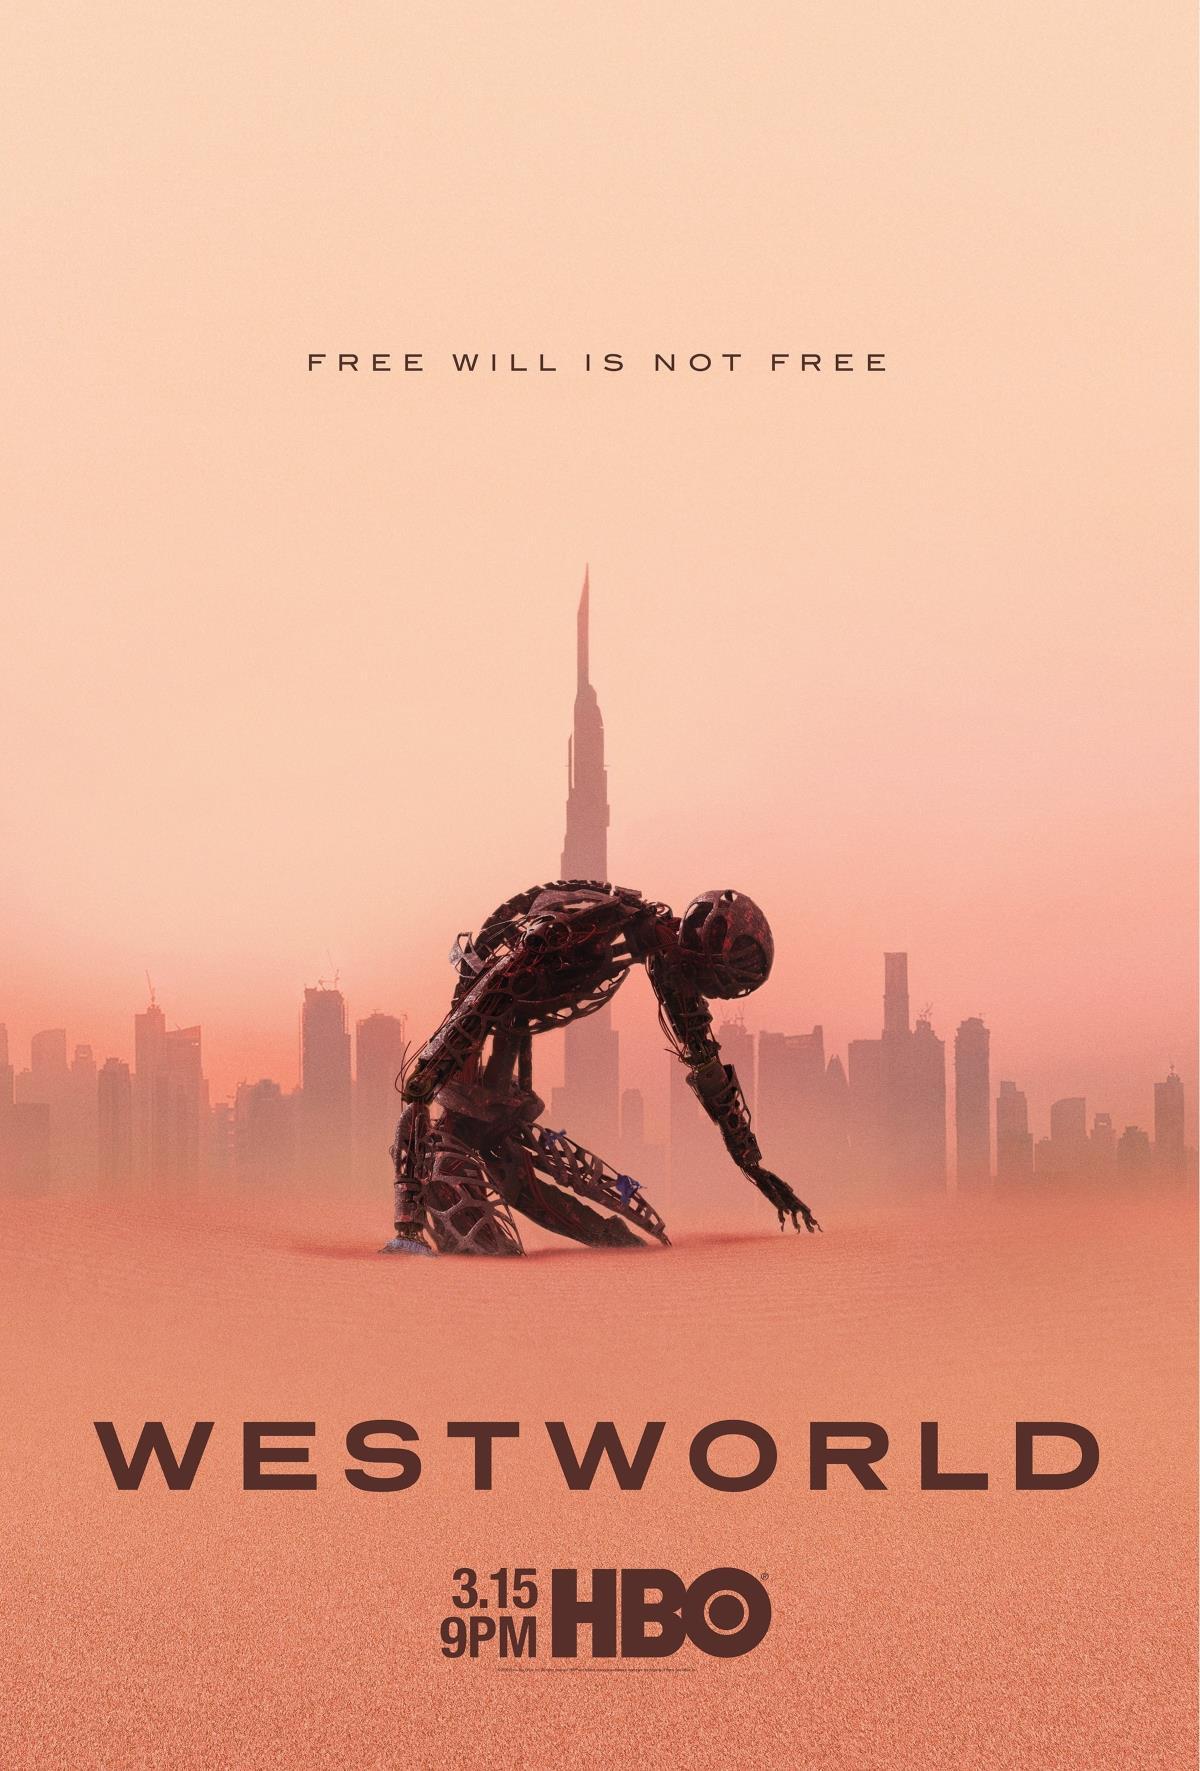 westworld season 3 poster Westworld season 3 poster